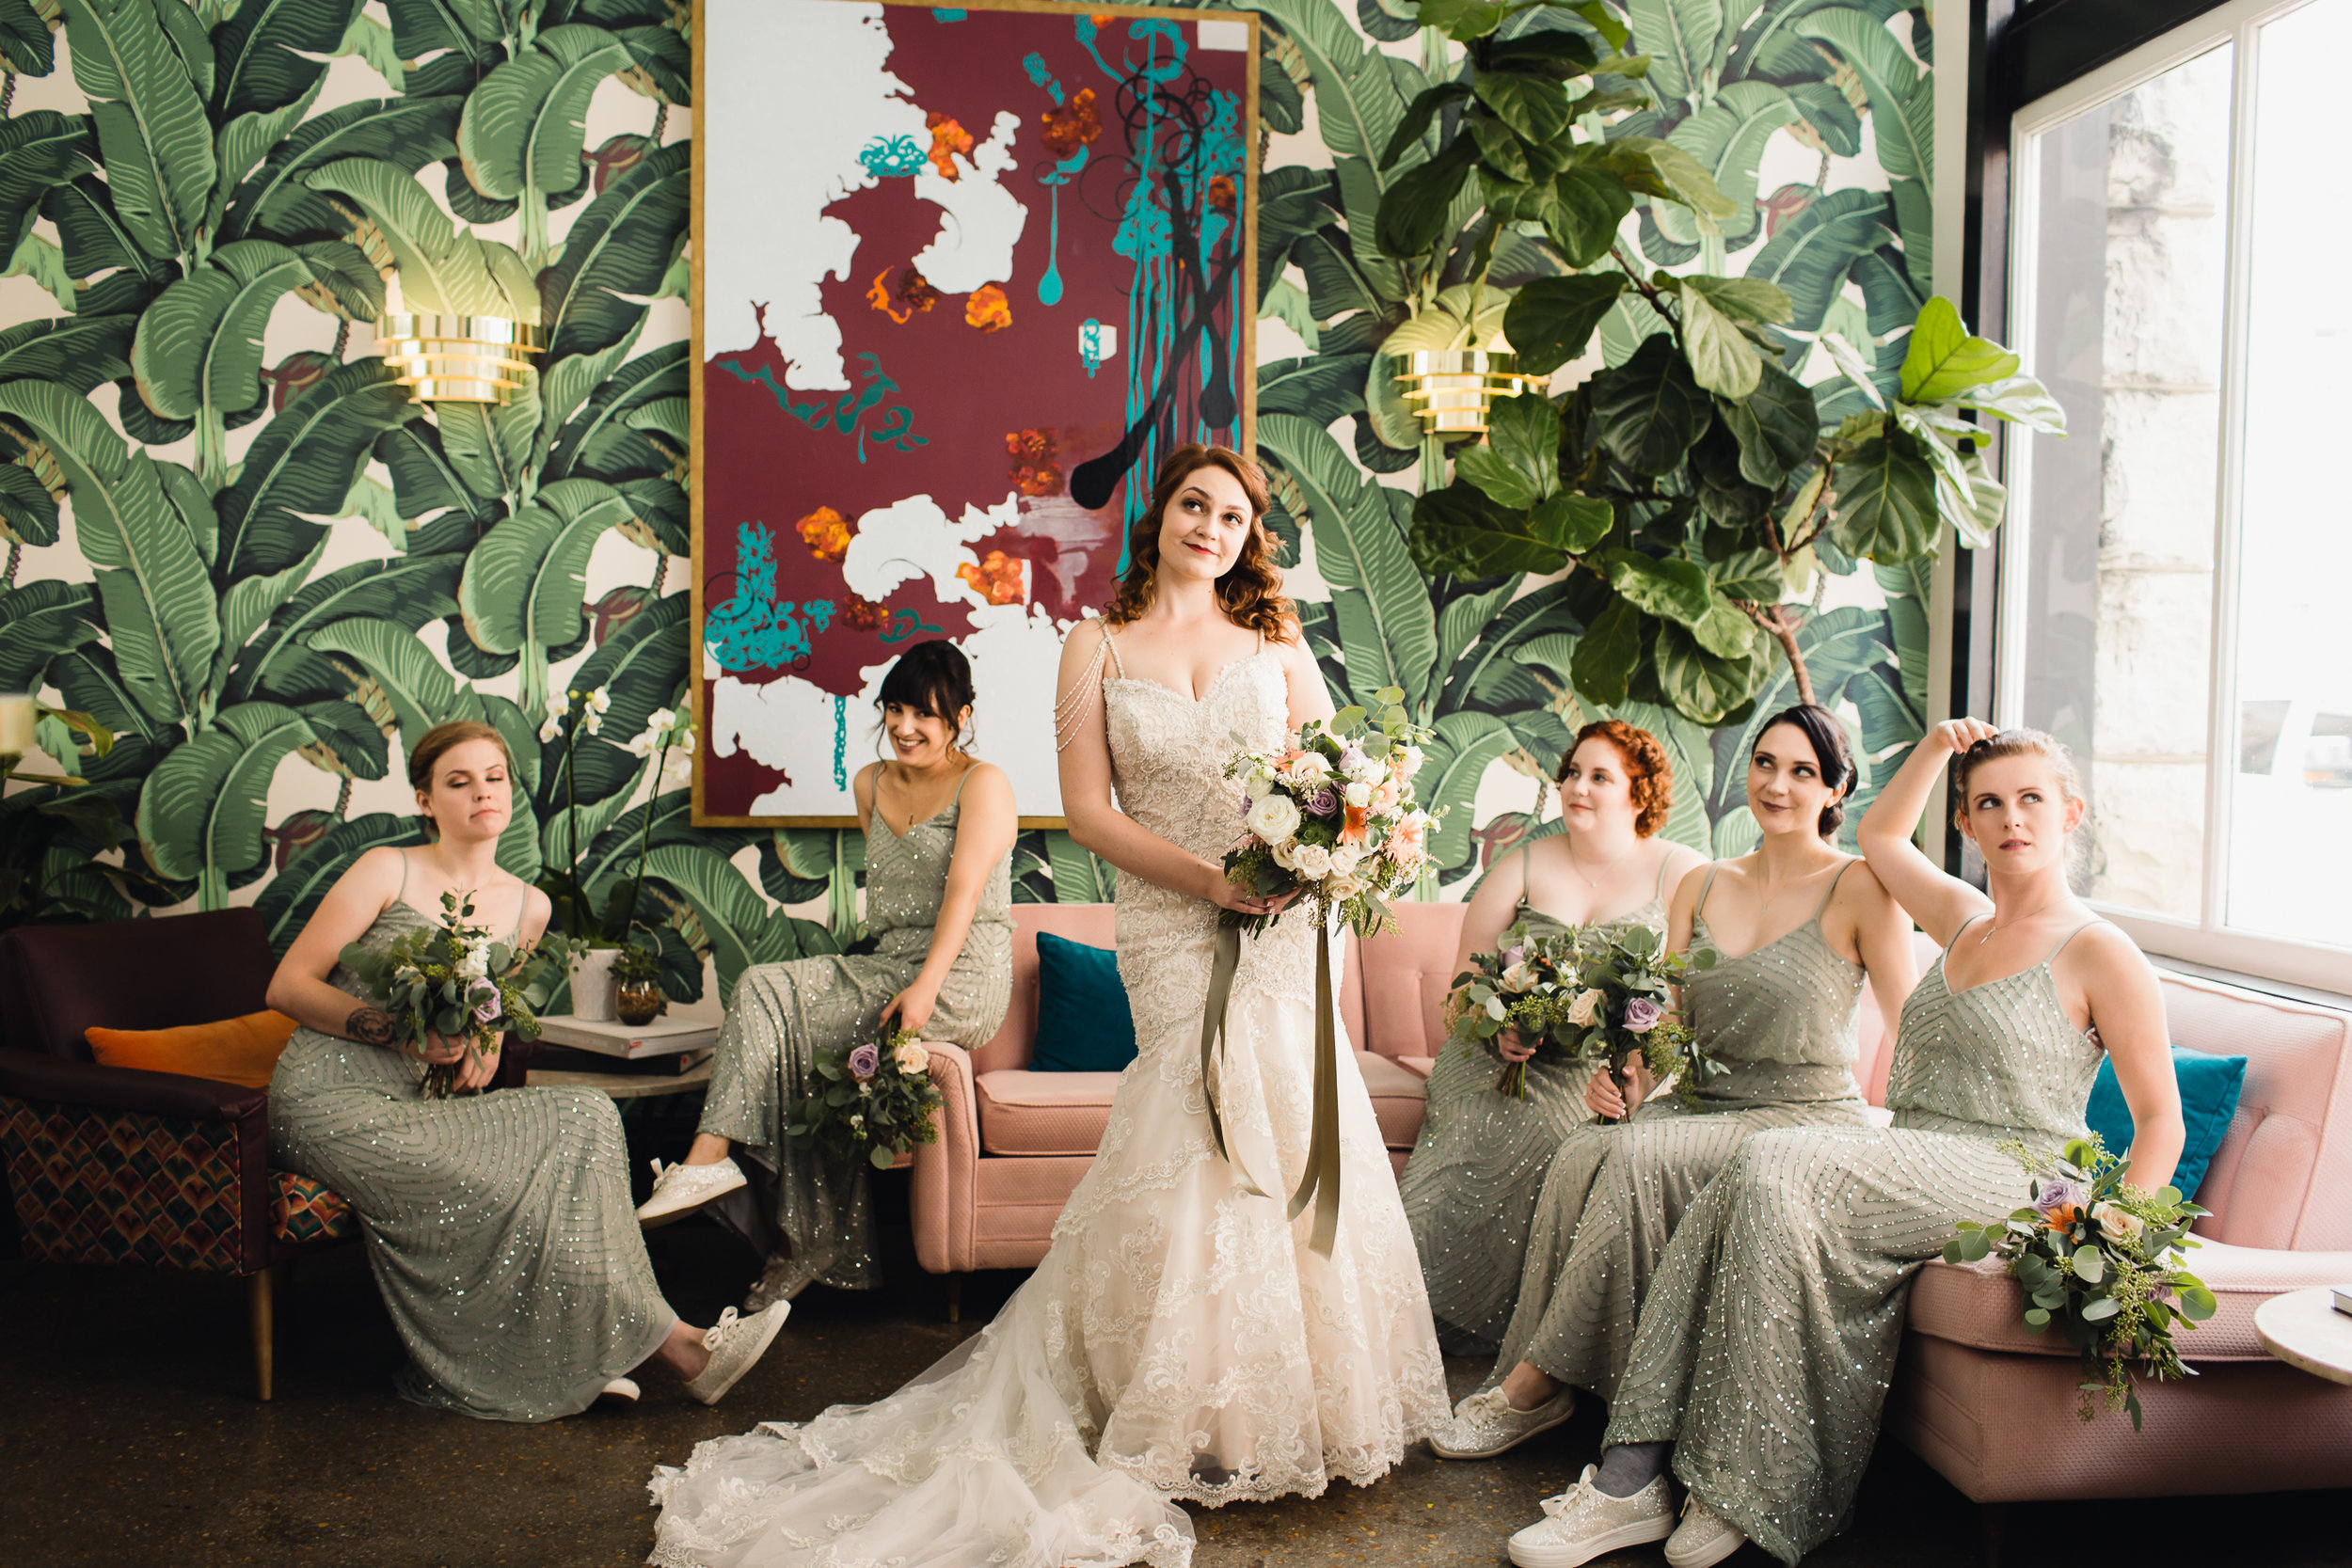 Gianna Keiko Atlanta Chattanooga Destination Wedding Portrait Photographer-22.jpg